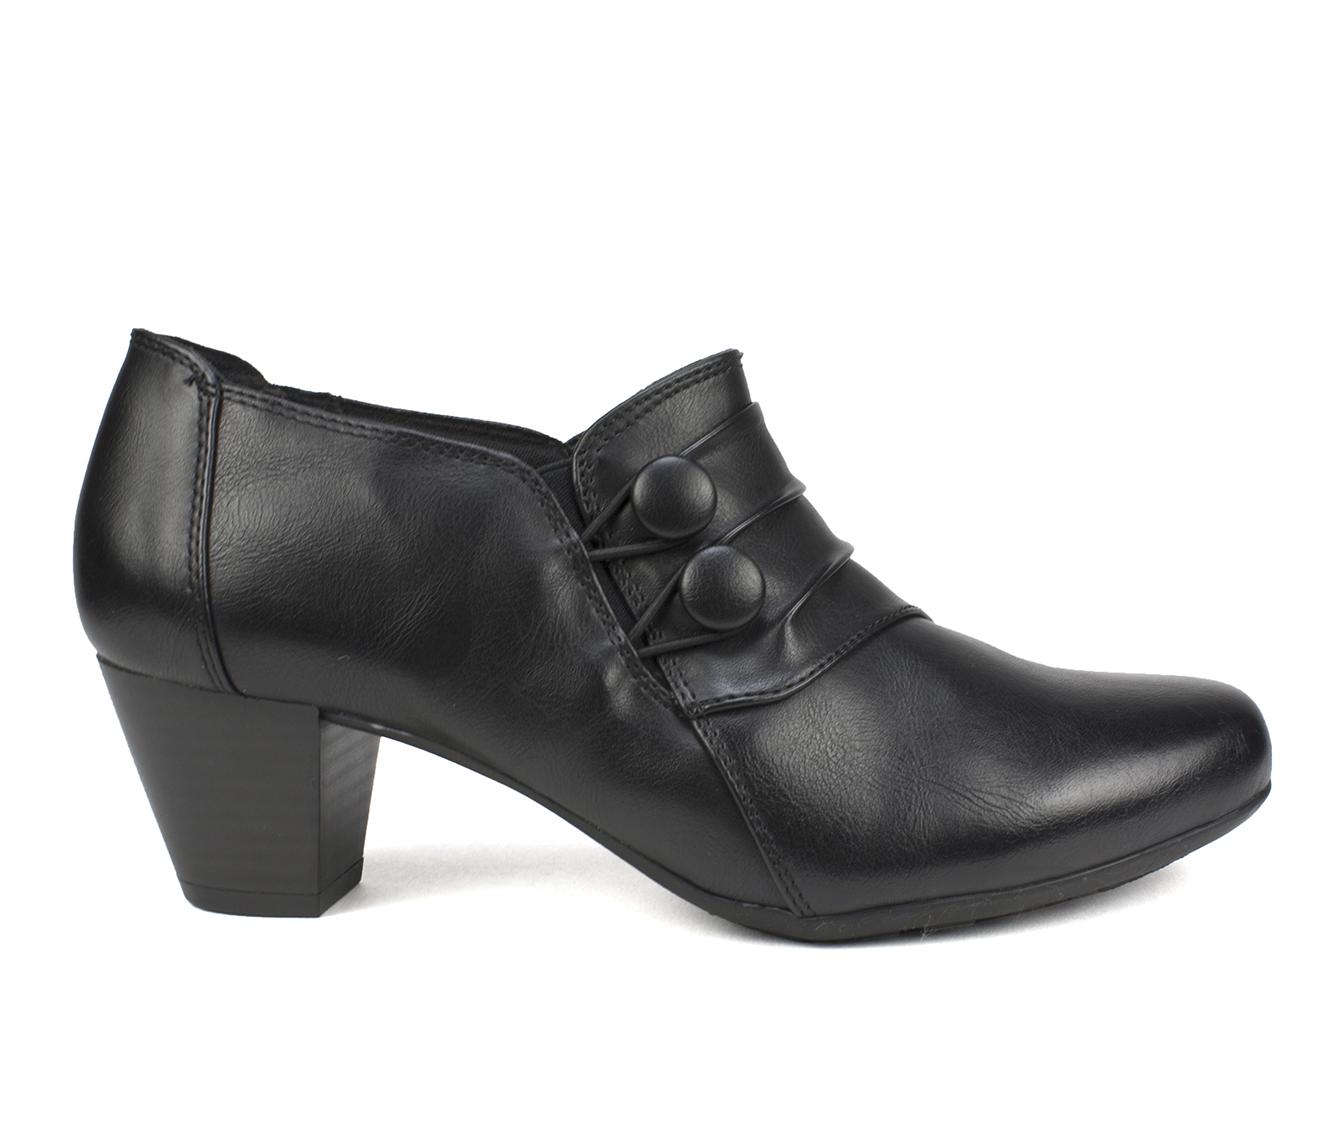 Cliffs Lampton Women's Dress Shoe (Black Faux Leather)